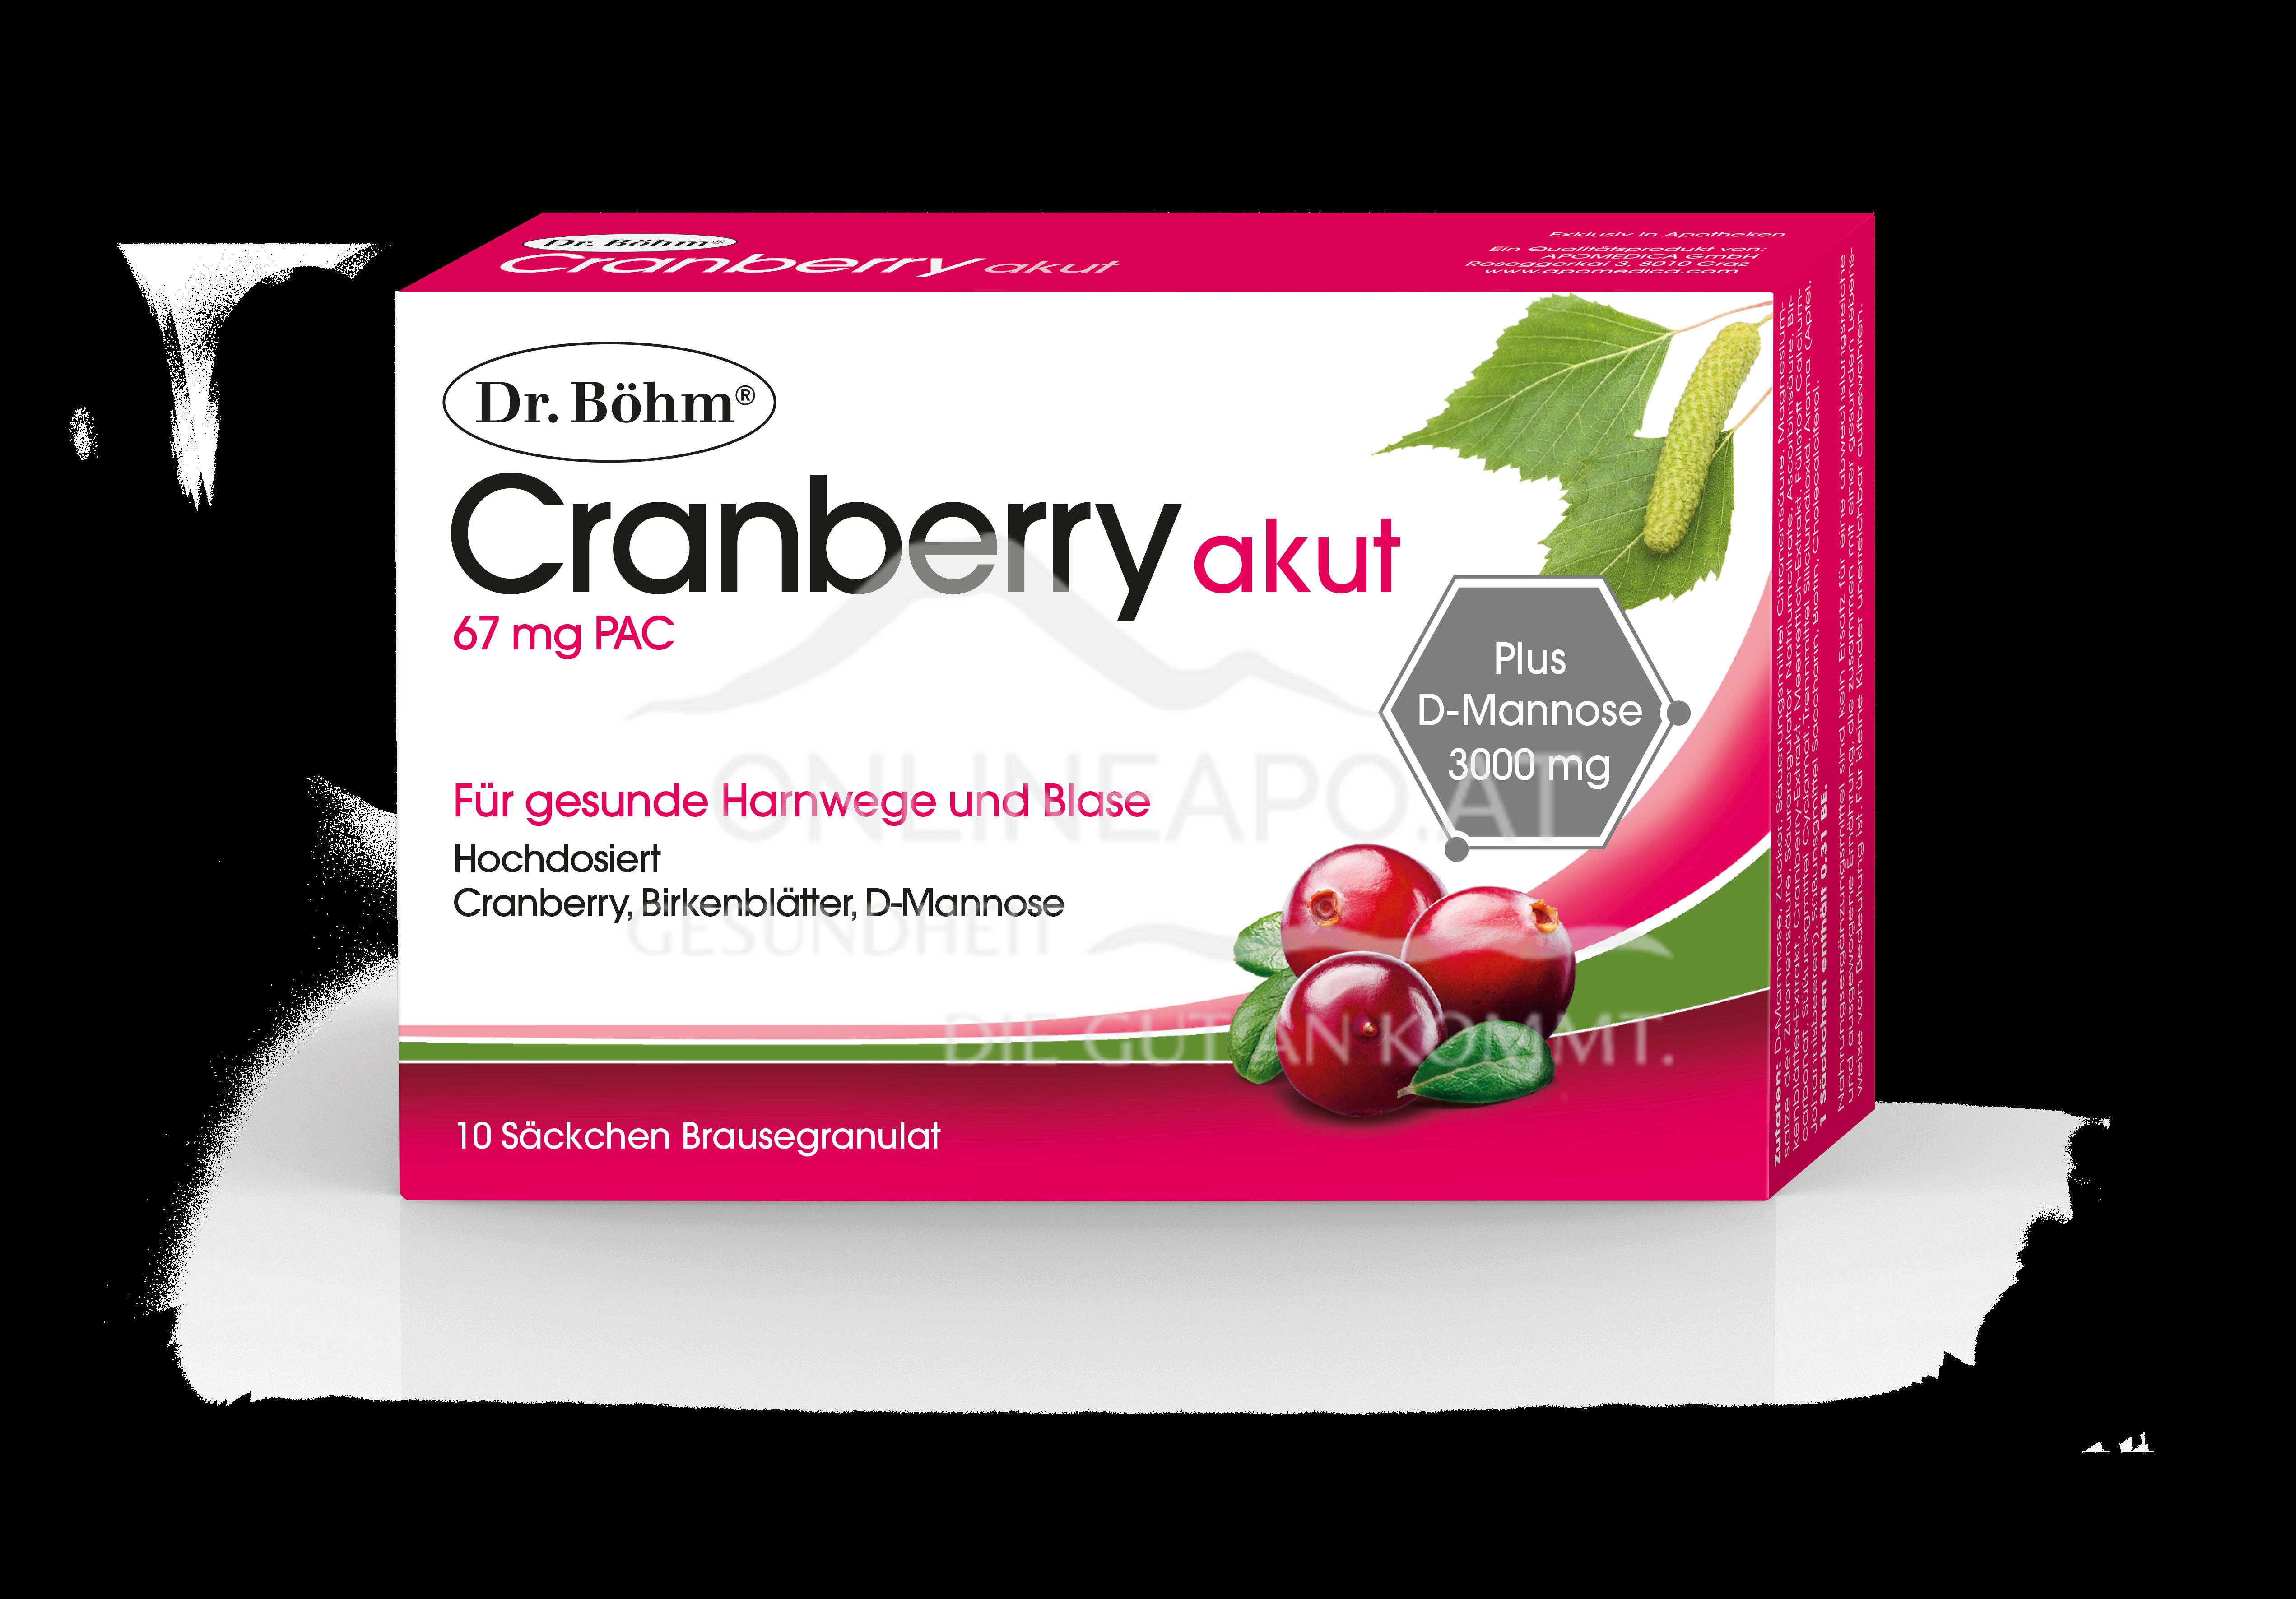 Dr. Böhm® Cranberry akut